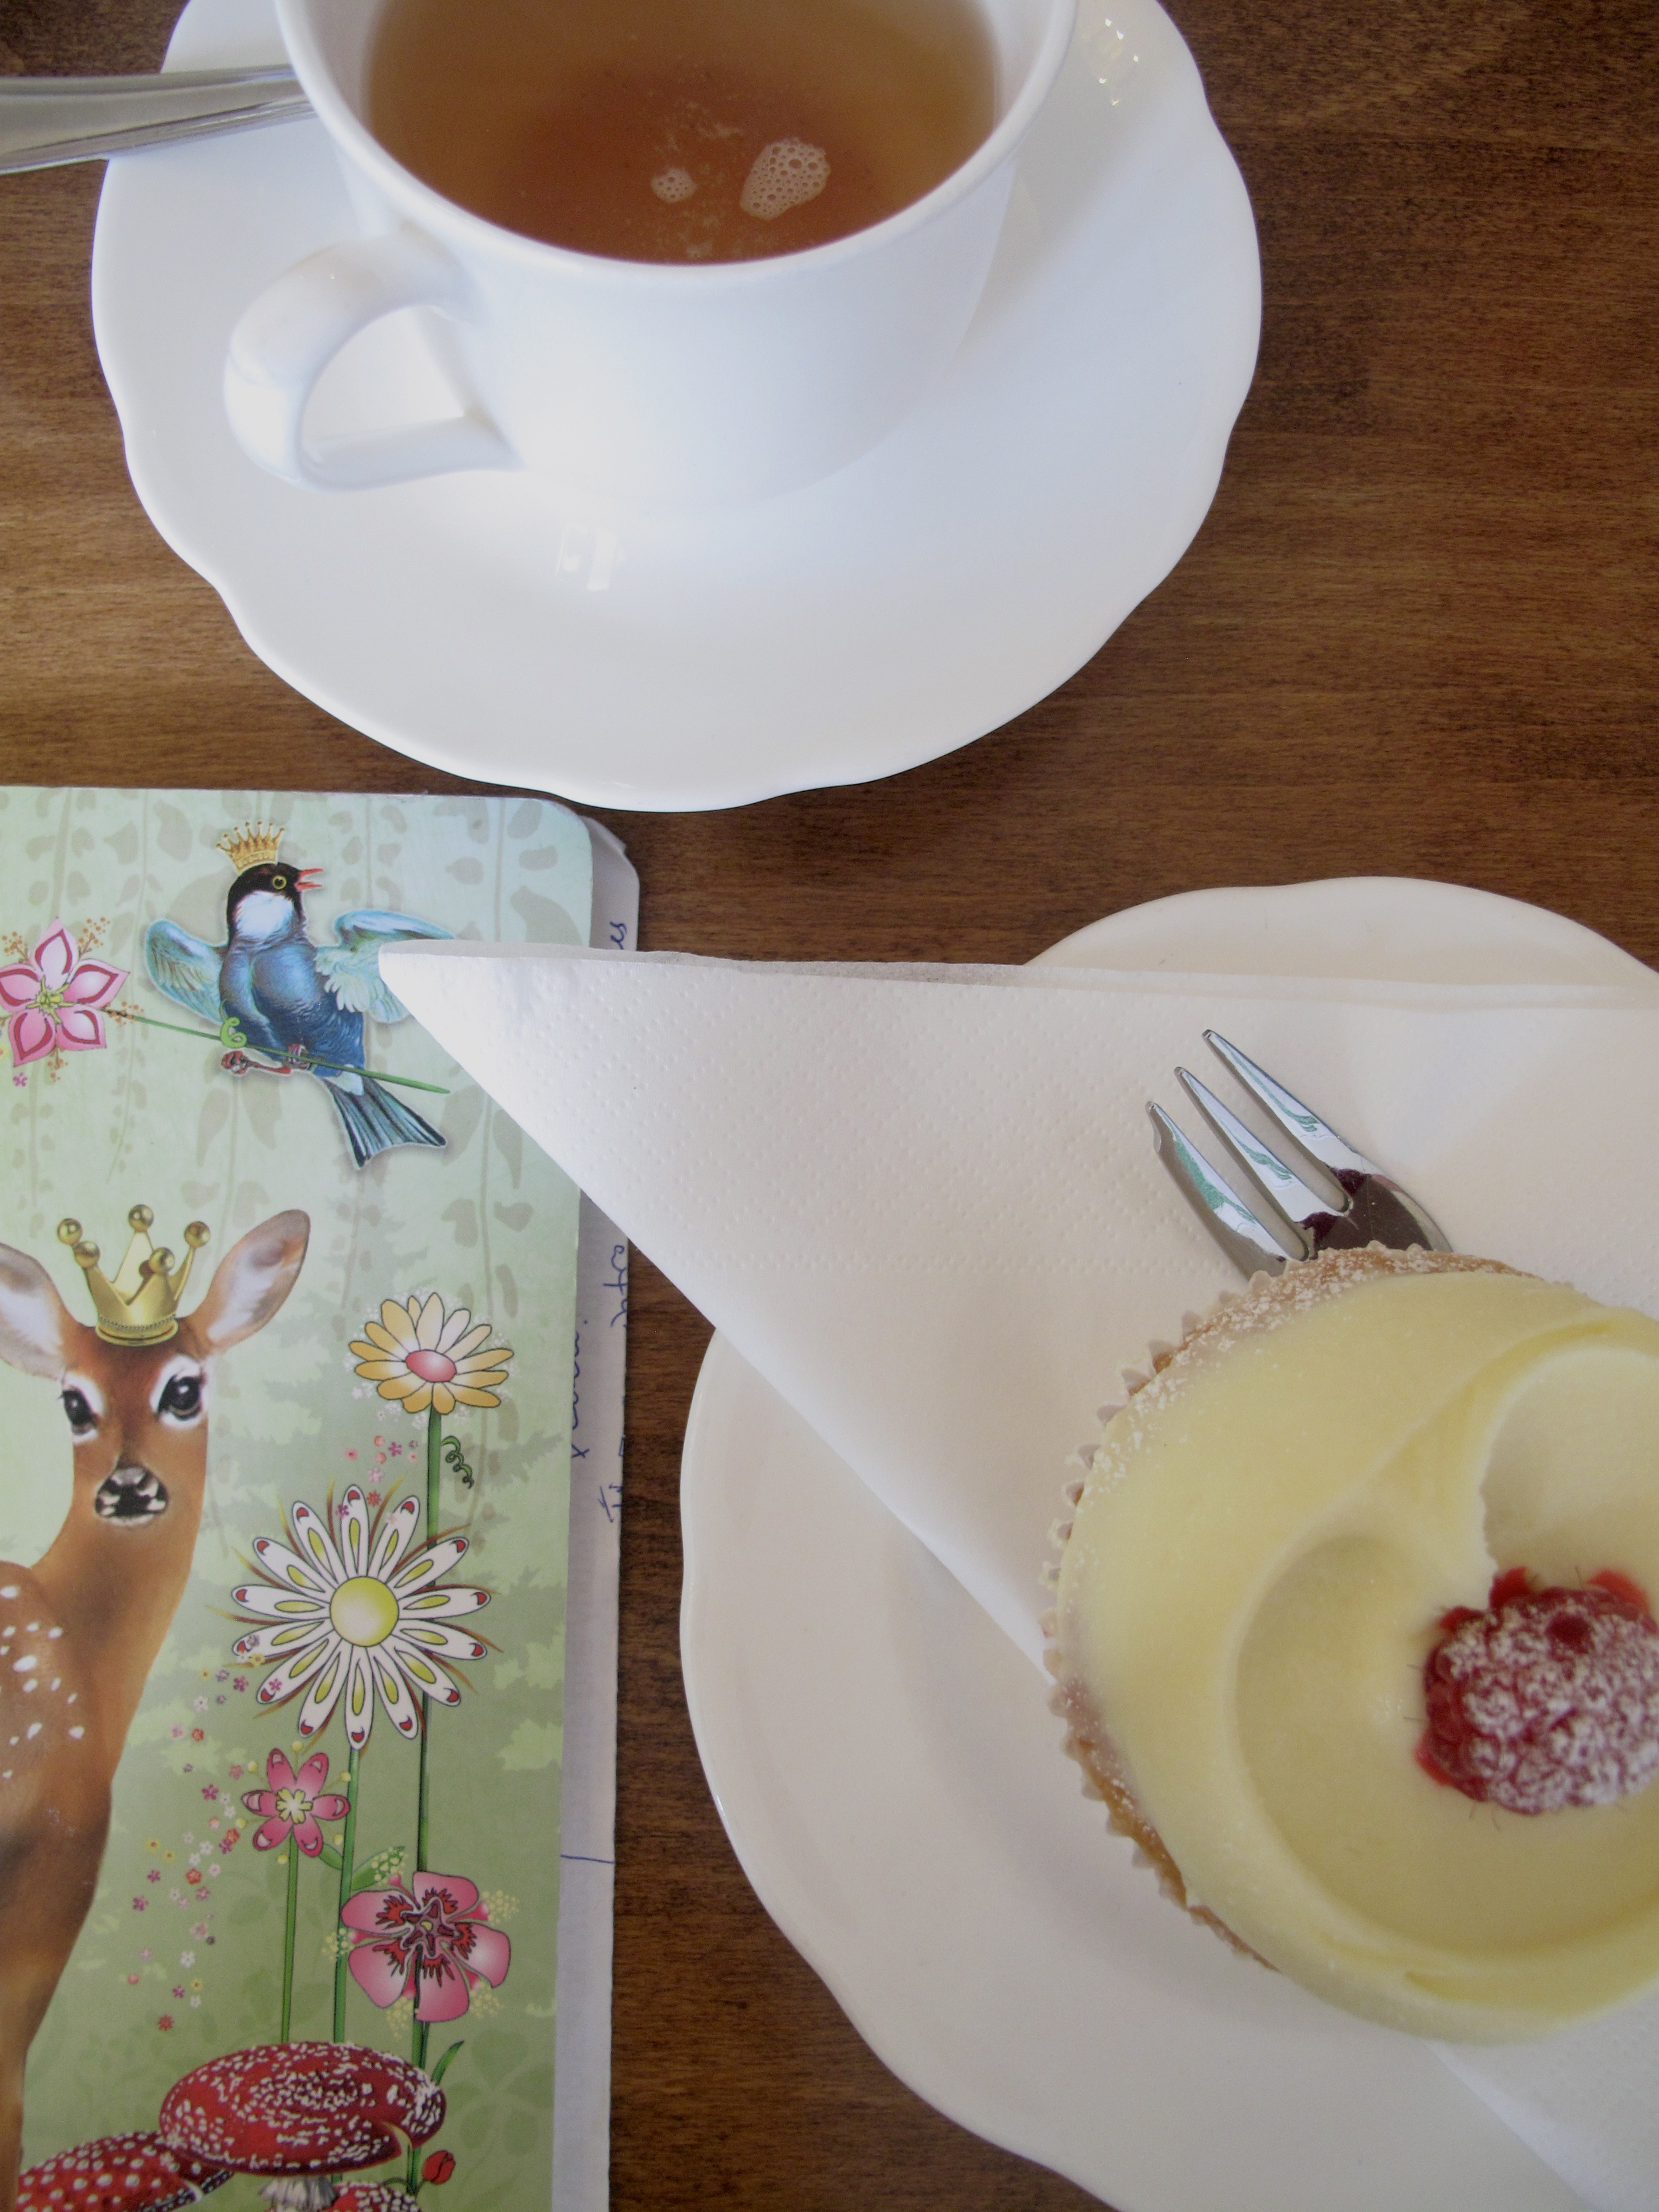 Cuckoo's Bakery Edinburgh - best cupcakes!